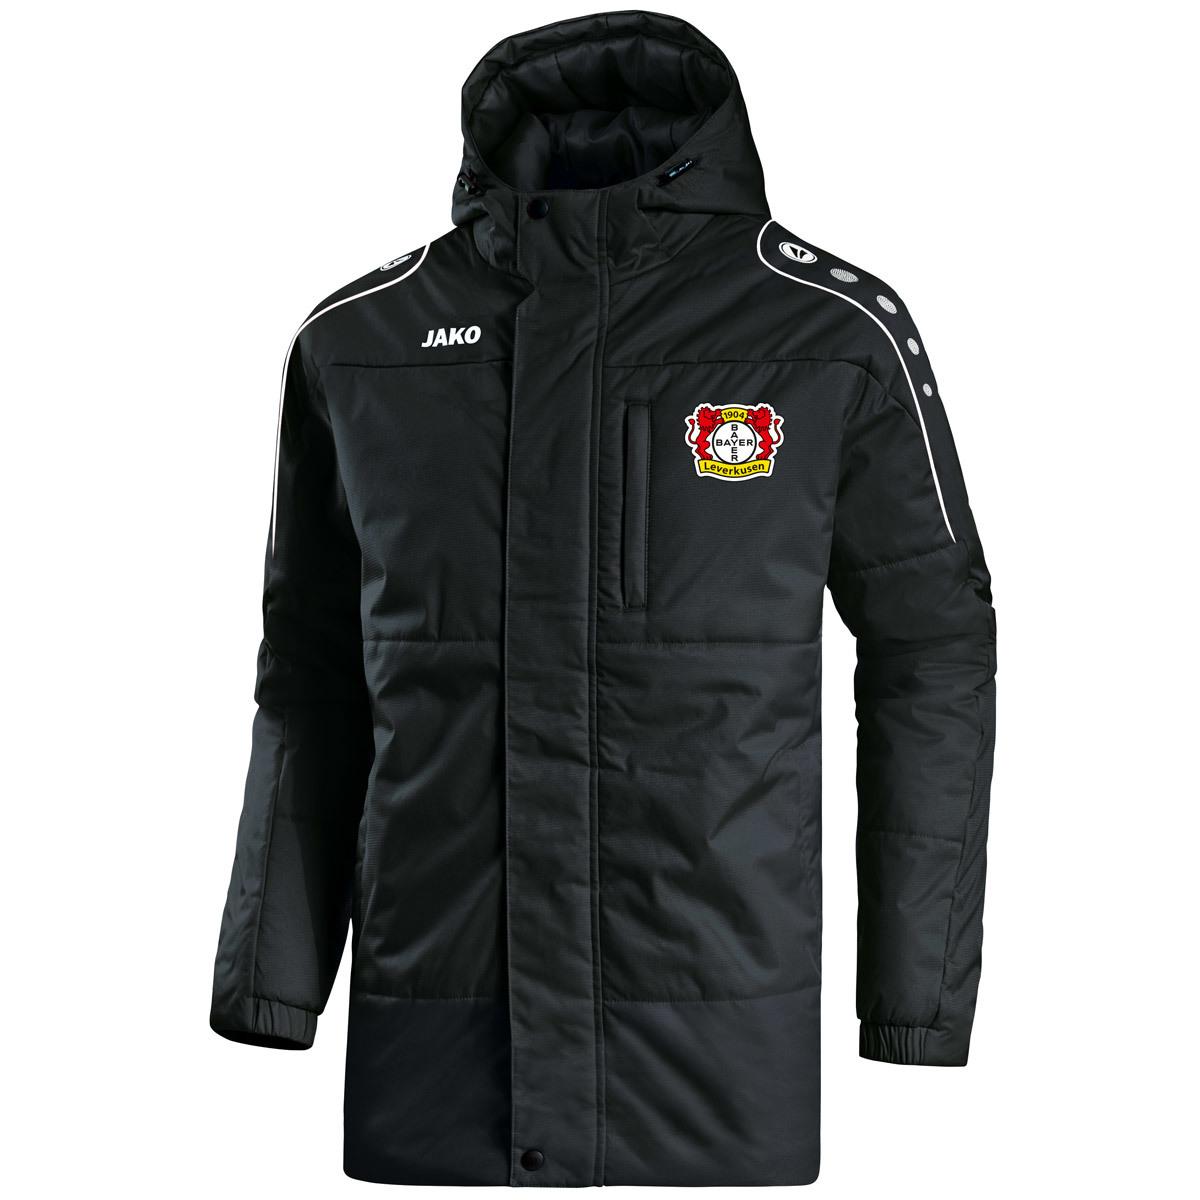 Tabellenführer Bayer 04 Leverkusen Jako Coachjacke reduziert